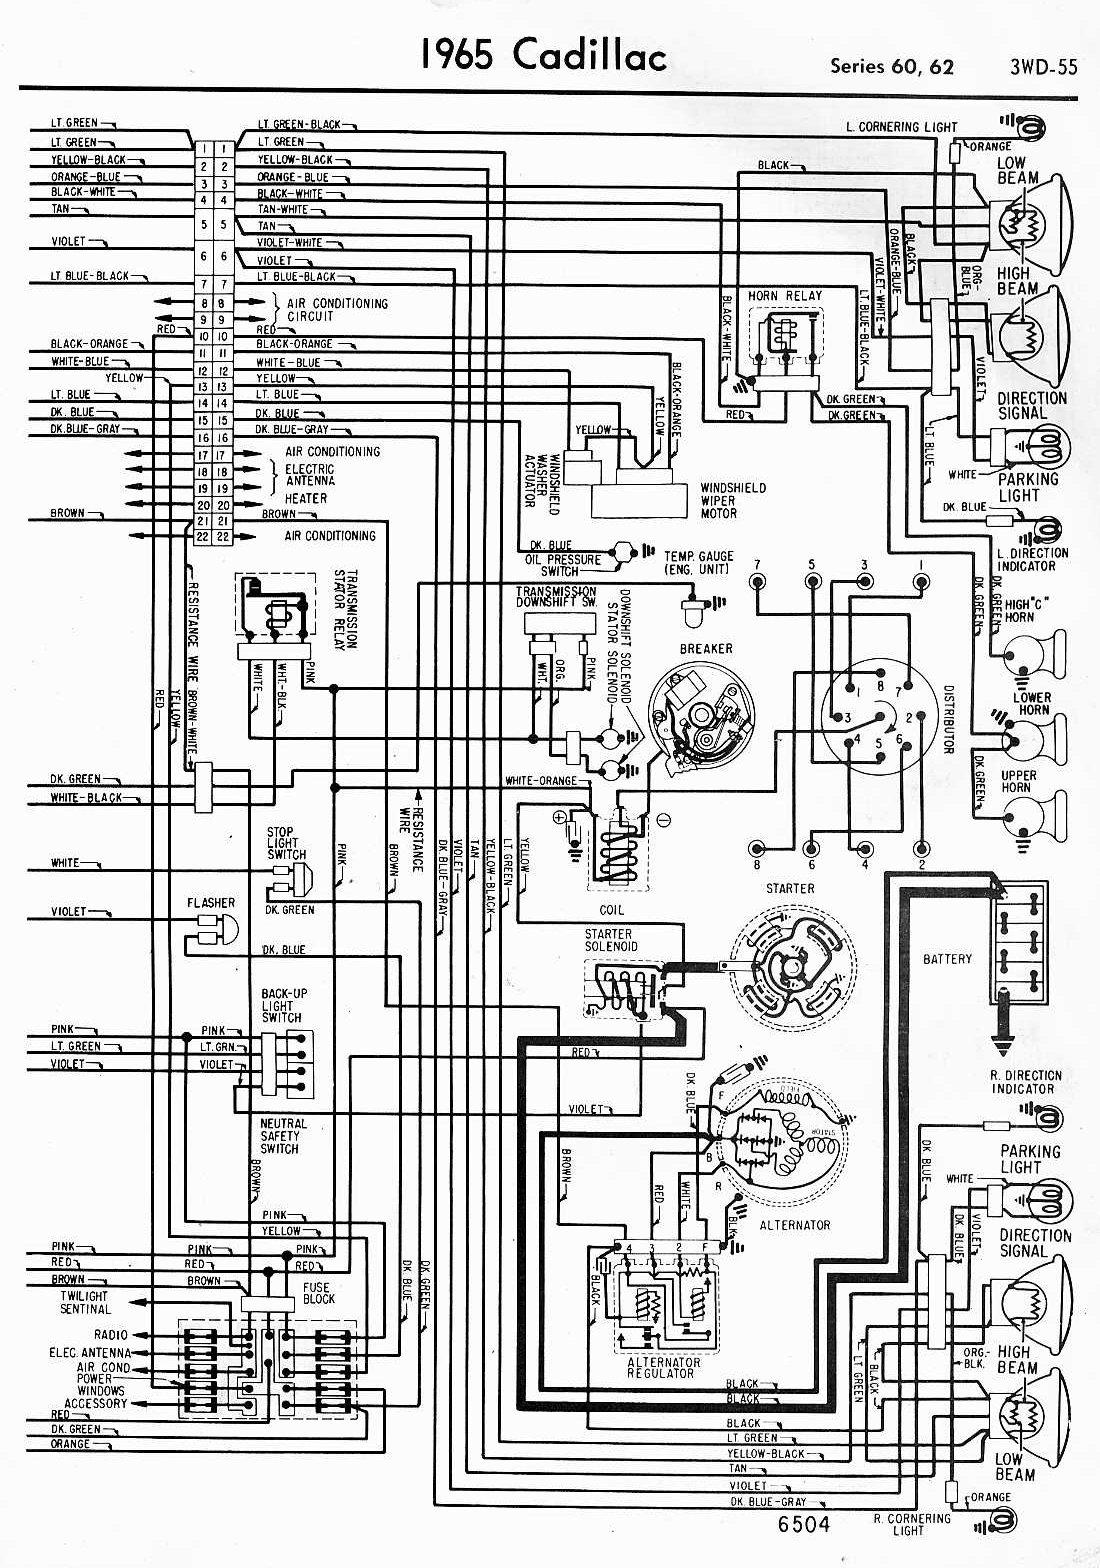 Cadillac car manuals wiring diagrams fault codes on cadillac deville  starter wiring jpg 1100x1568 1963 cadillac